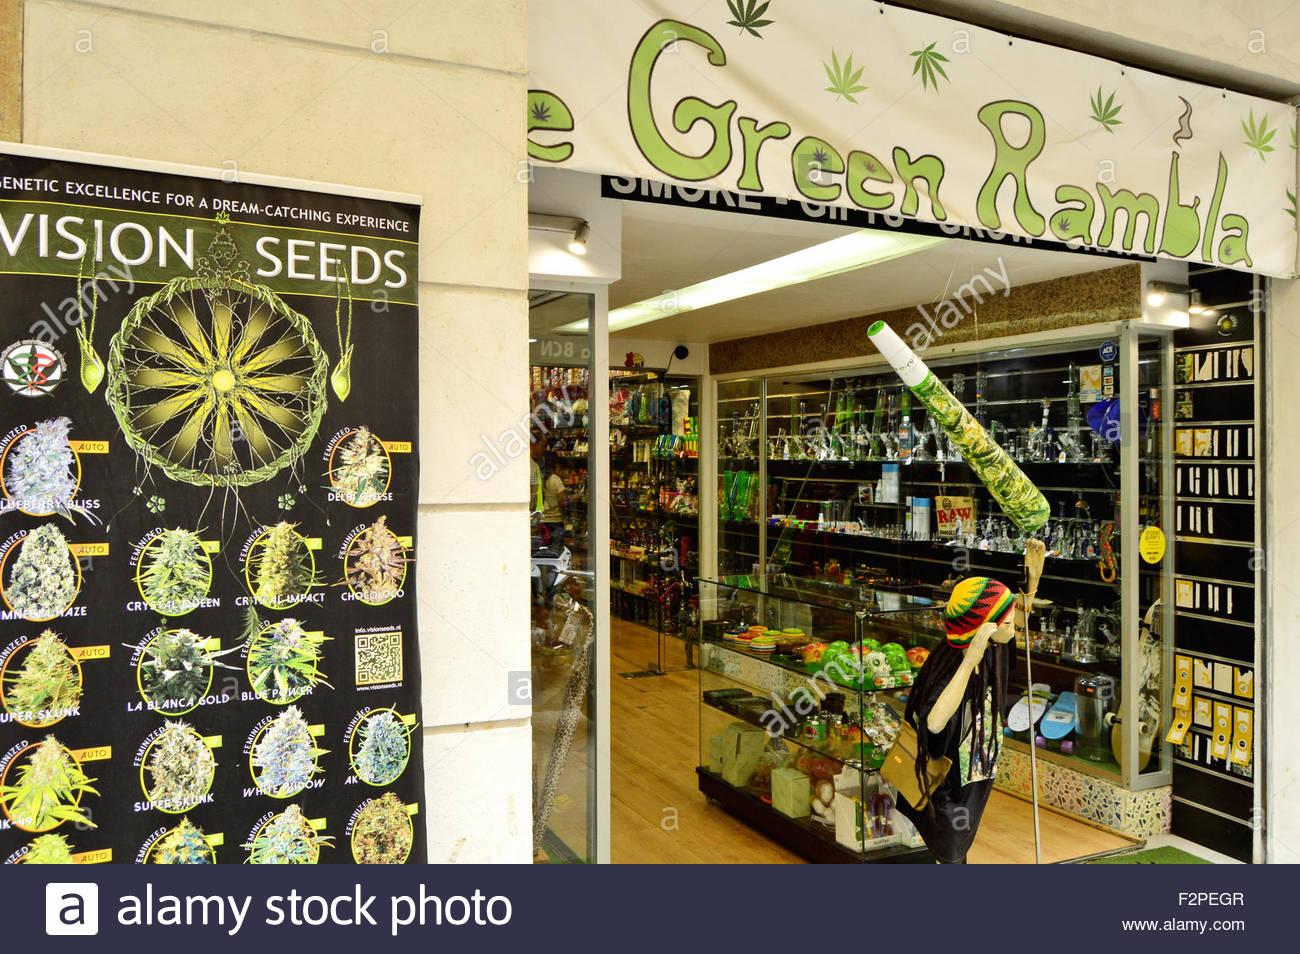 'The Green Rambla' cannabis seeds and gift shop in Ciutat Vella Barcelona Catalonia Spain Europe - Stock Image